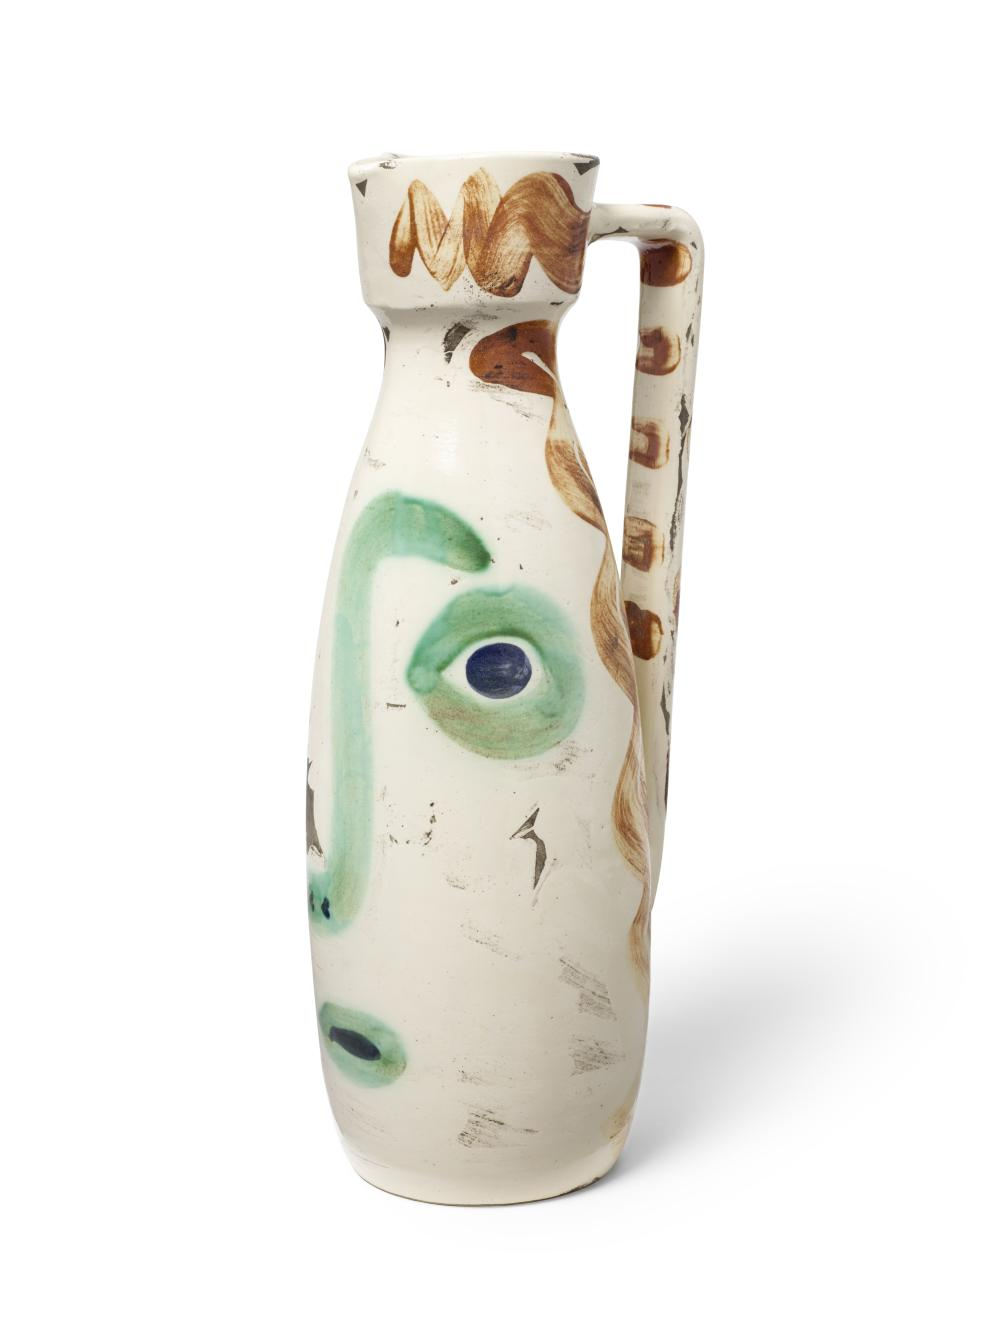 Pablo Picasso (1881-1973); Visage;